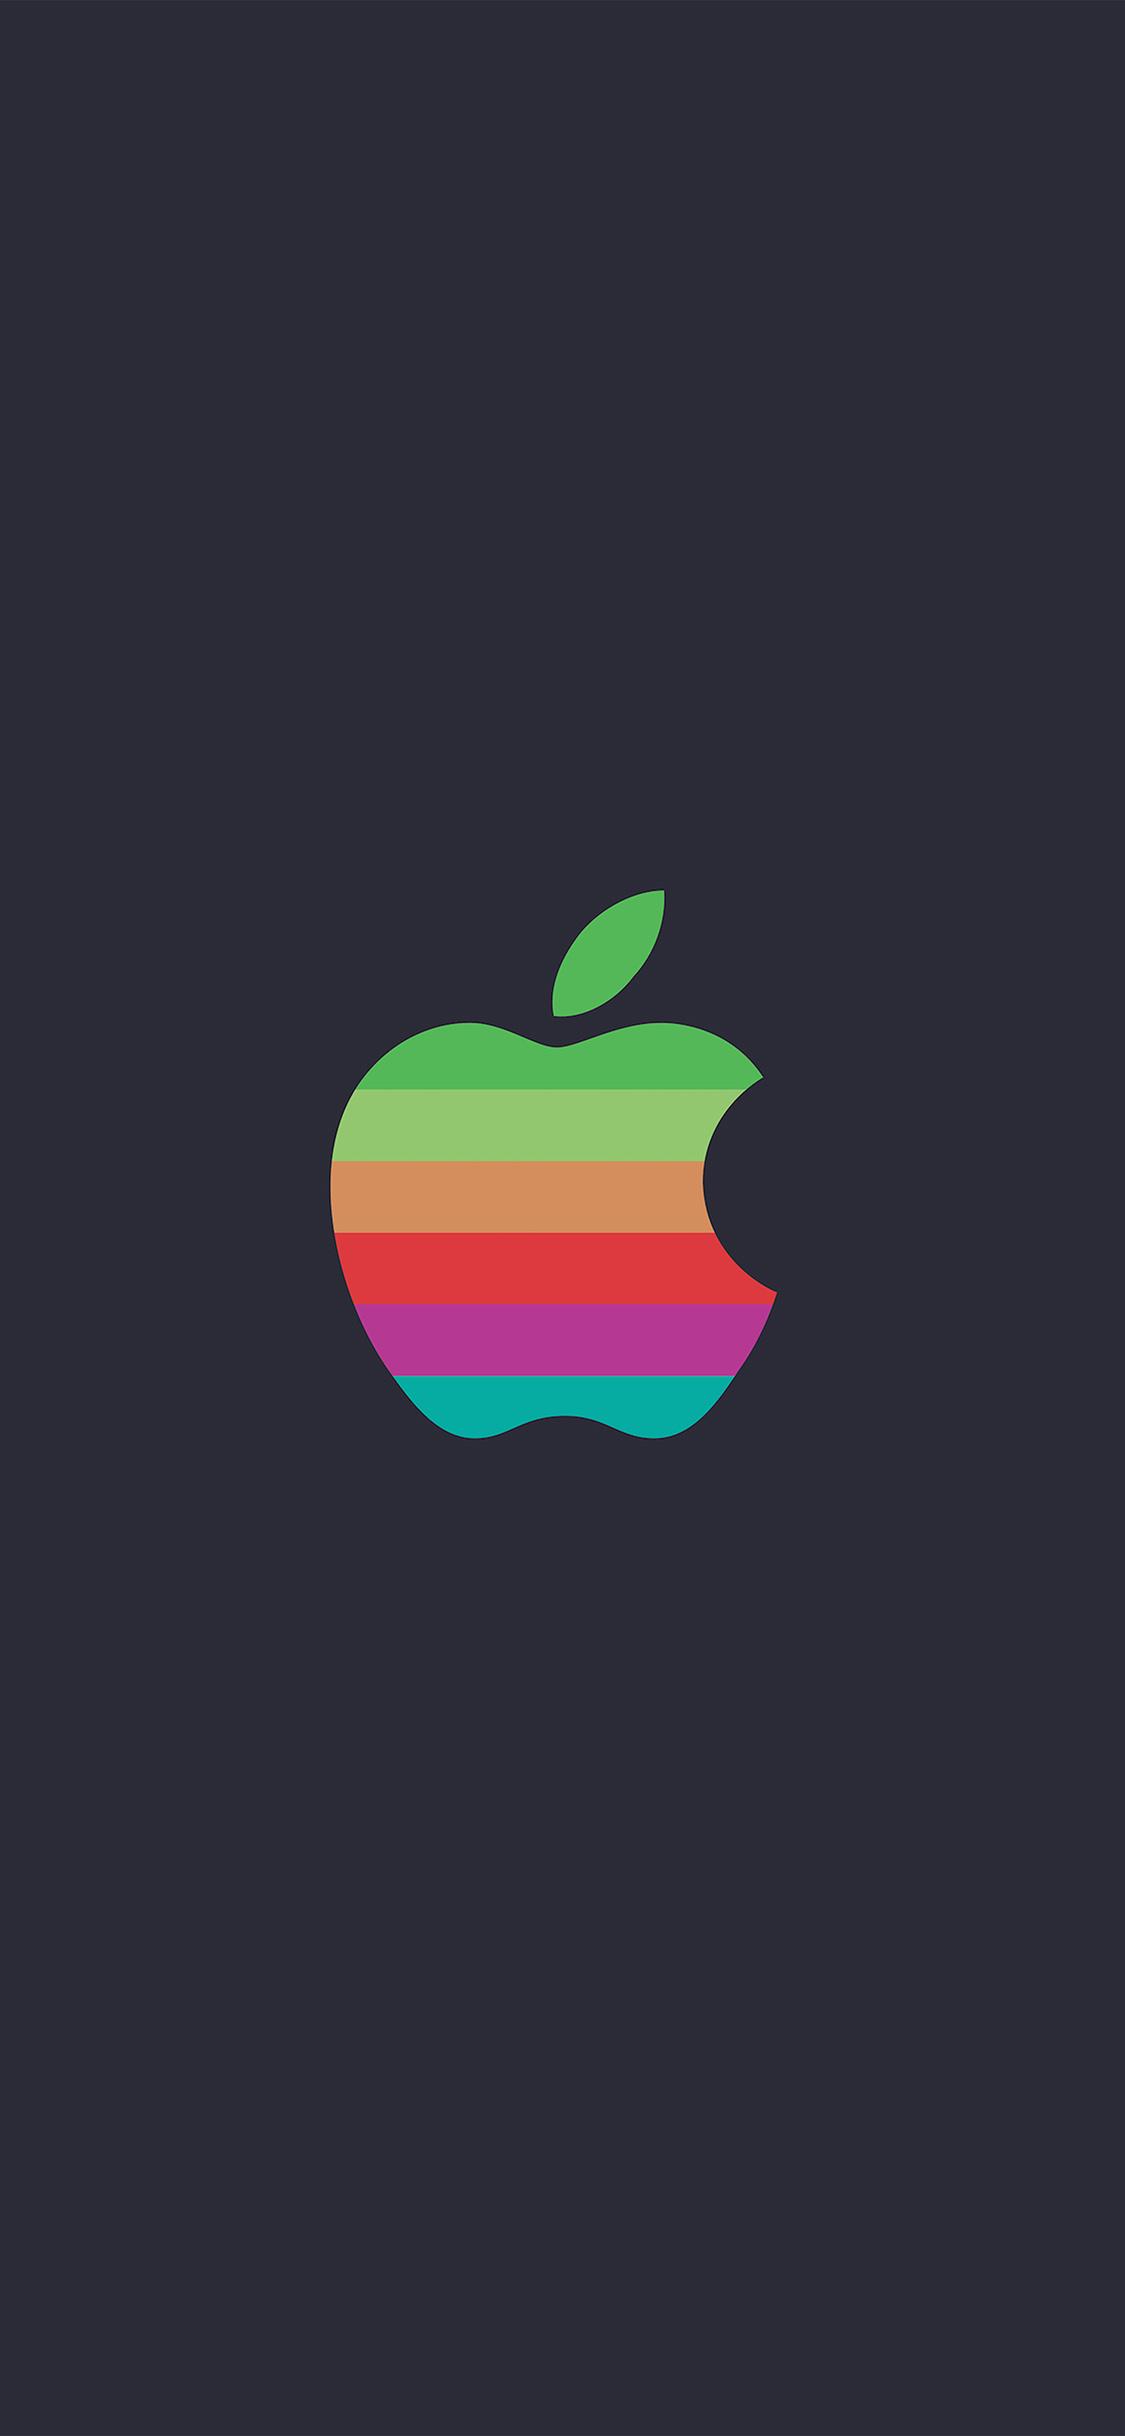 iPhoneXpapers.com-Apple-iPhone-wallpaper-aw31-minimal-logo-apple-color-dark-illustration-art